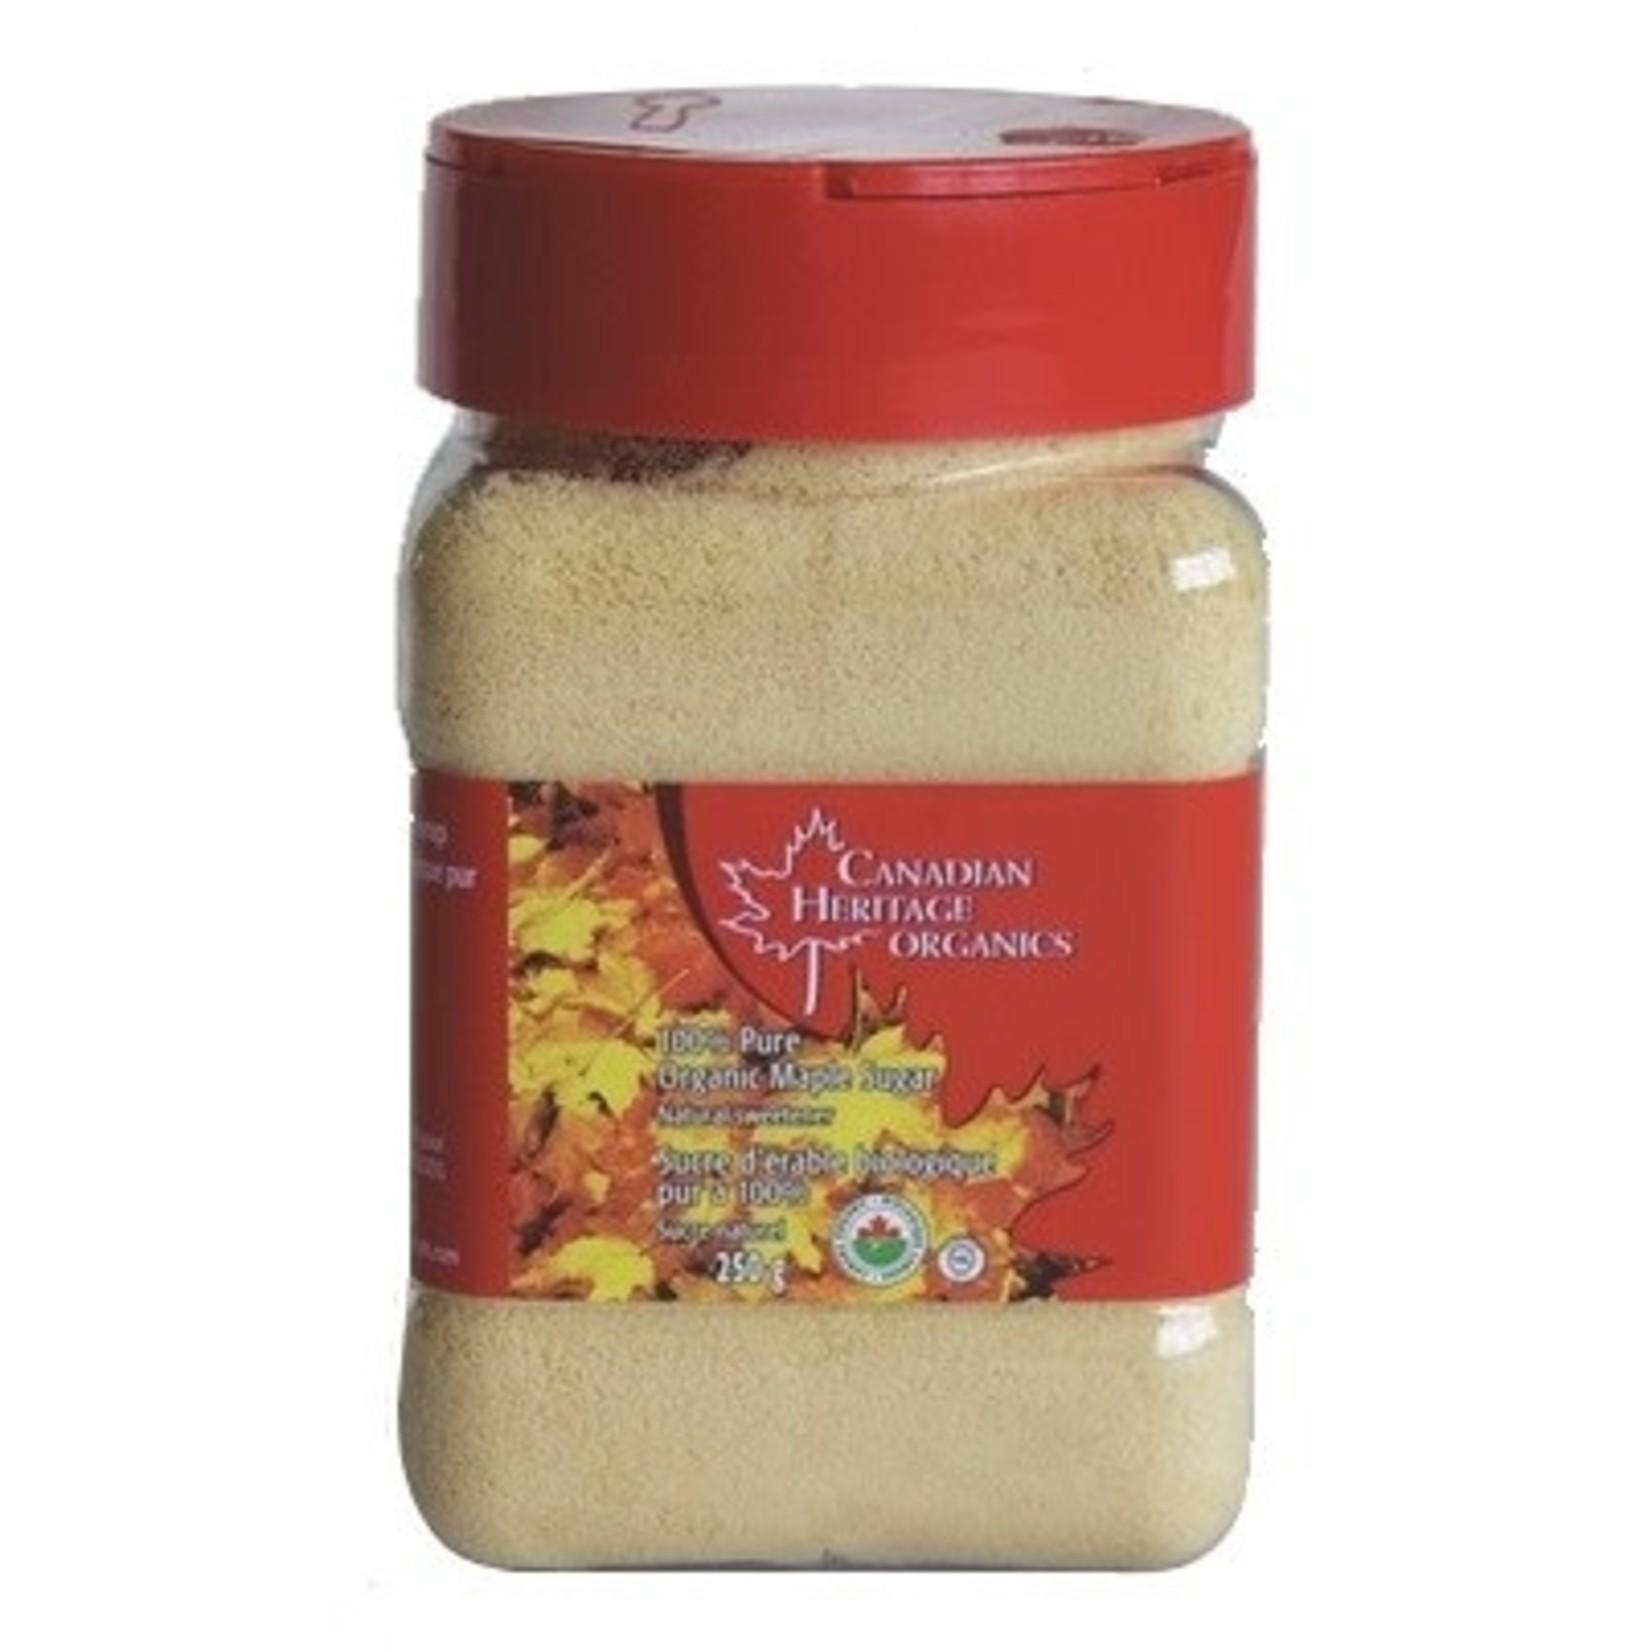 Canadian Heritage Organics Canadian Heritage Organics 100% Pure Maple Sugar